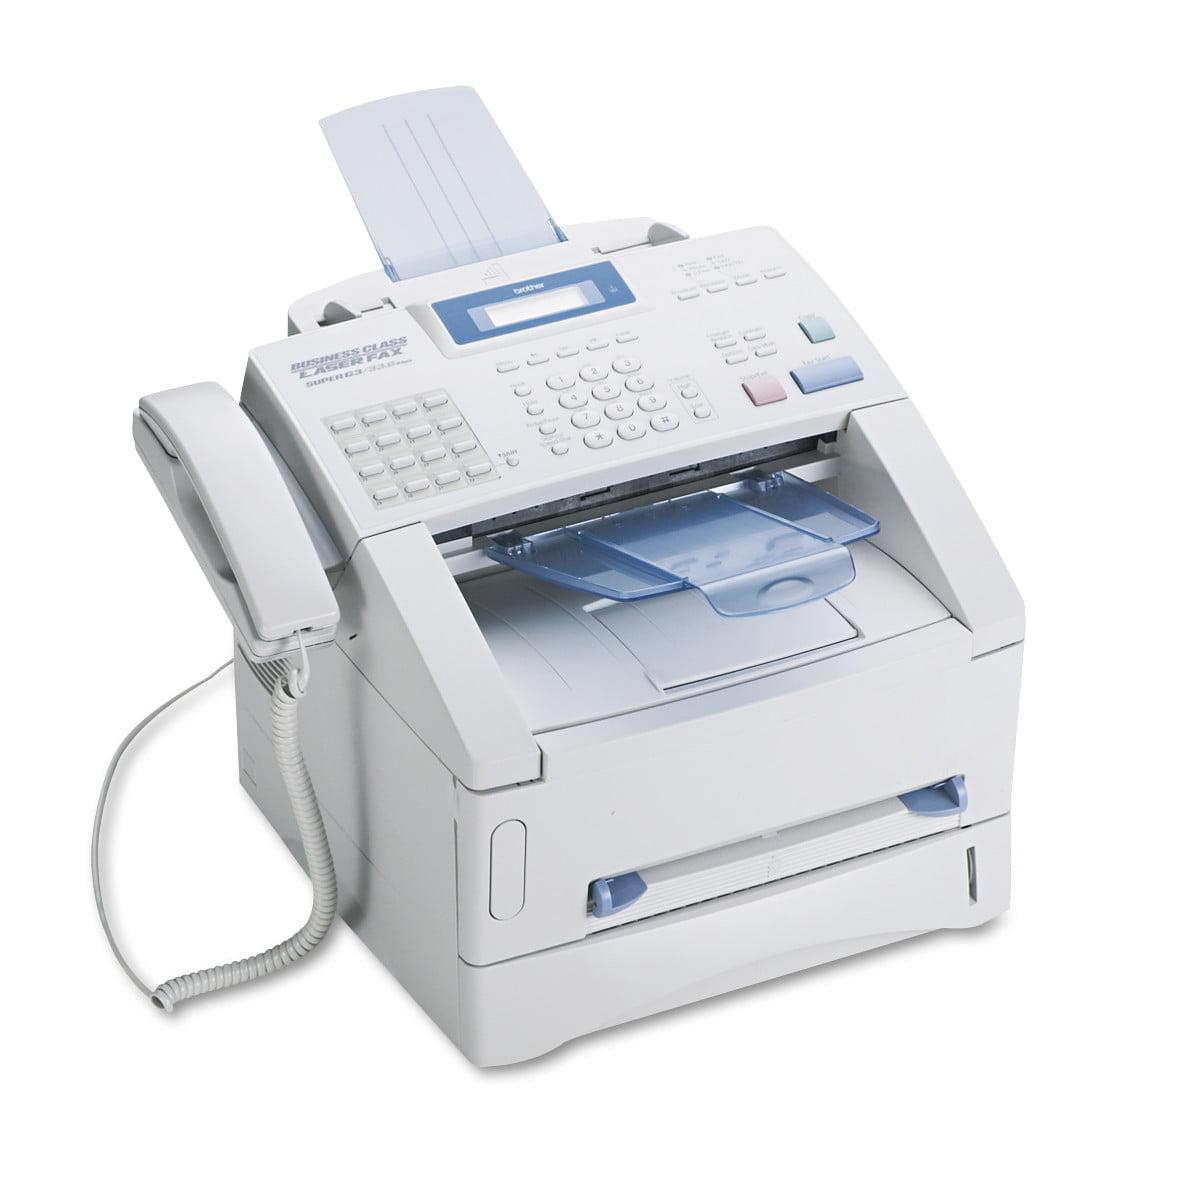 brother intellifax 4750e laser multifunction printer monochrome rh walmart com brother fax 4750e service manual brother intellifax 4750e service manual